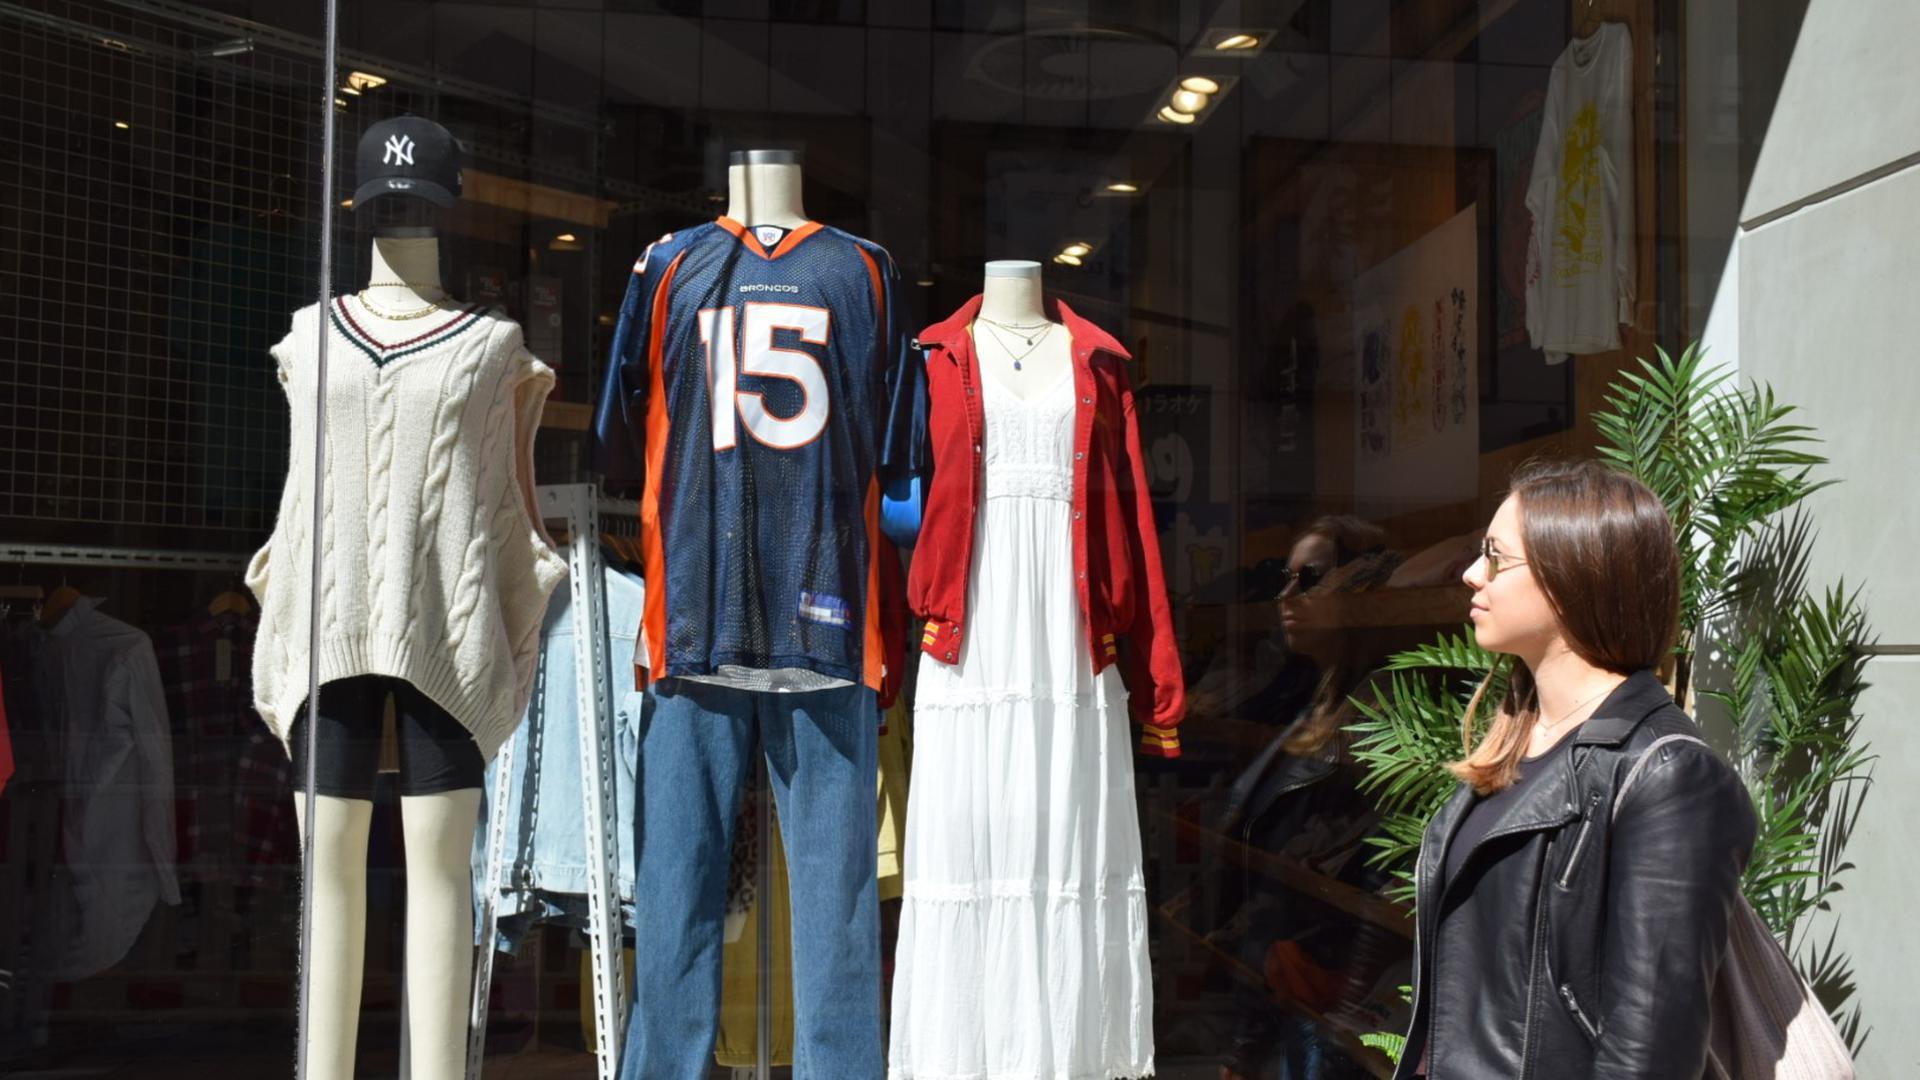 Bewusst shoppen: Sandra Overlack aus Rastatt kauft fast ausschließlich Second-Hand-Kleidung, um weniger Ressourcen zu verbrauchen.